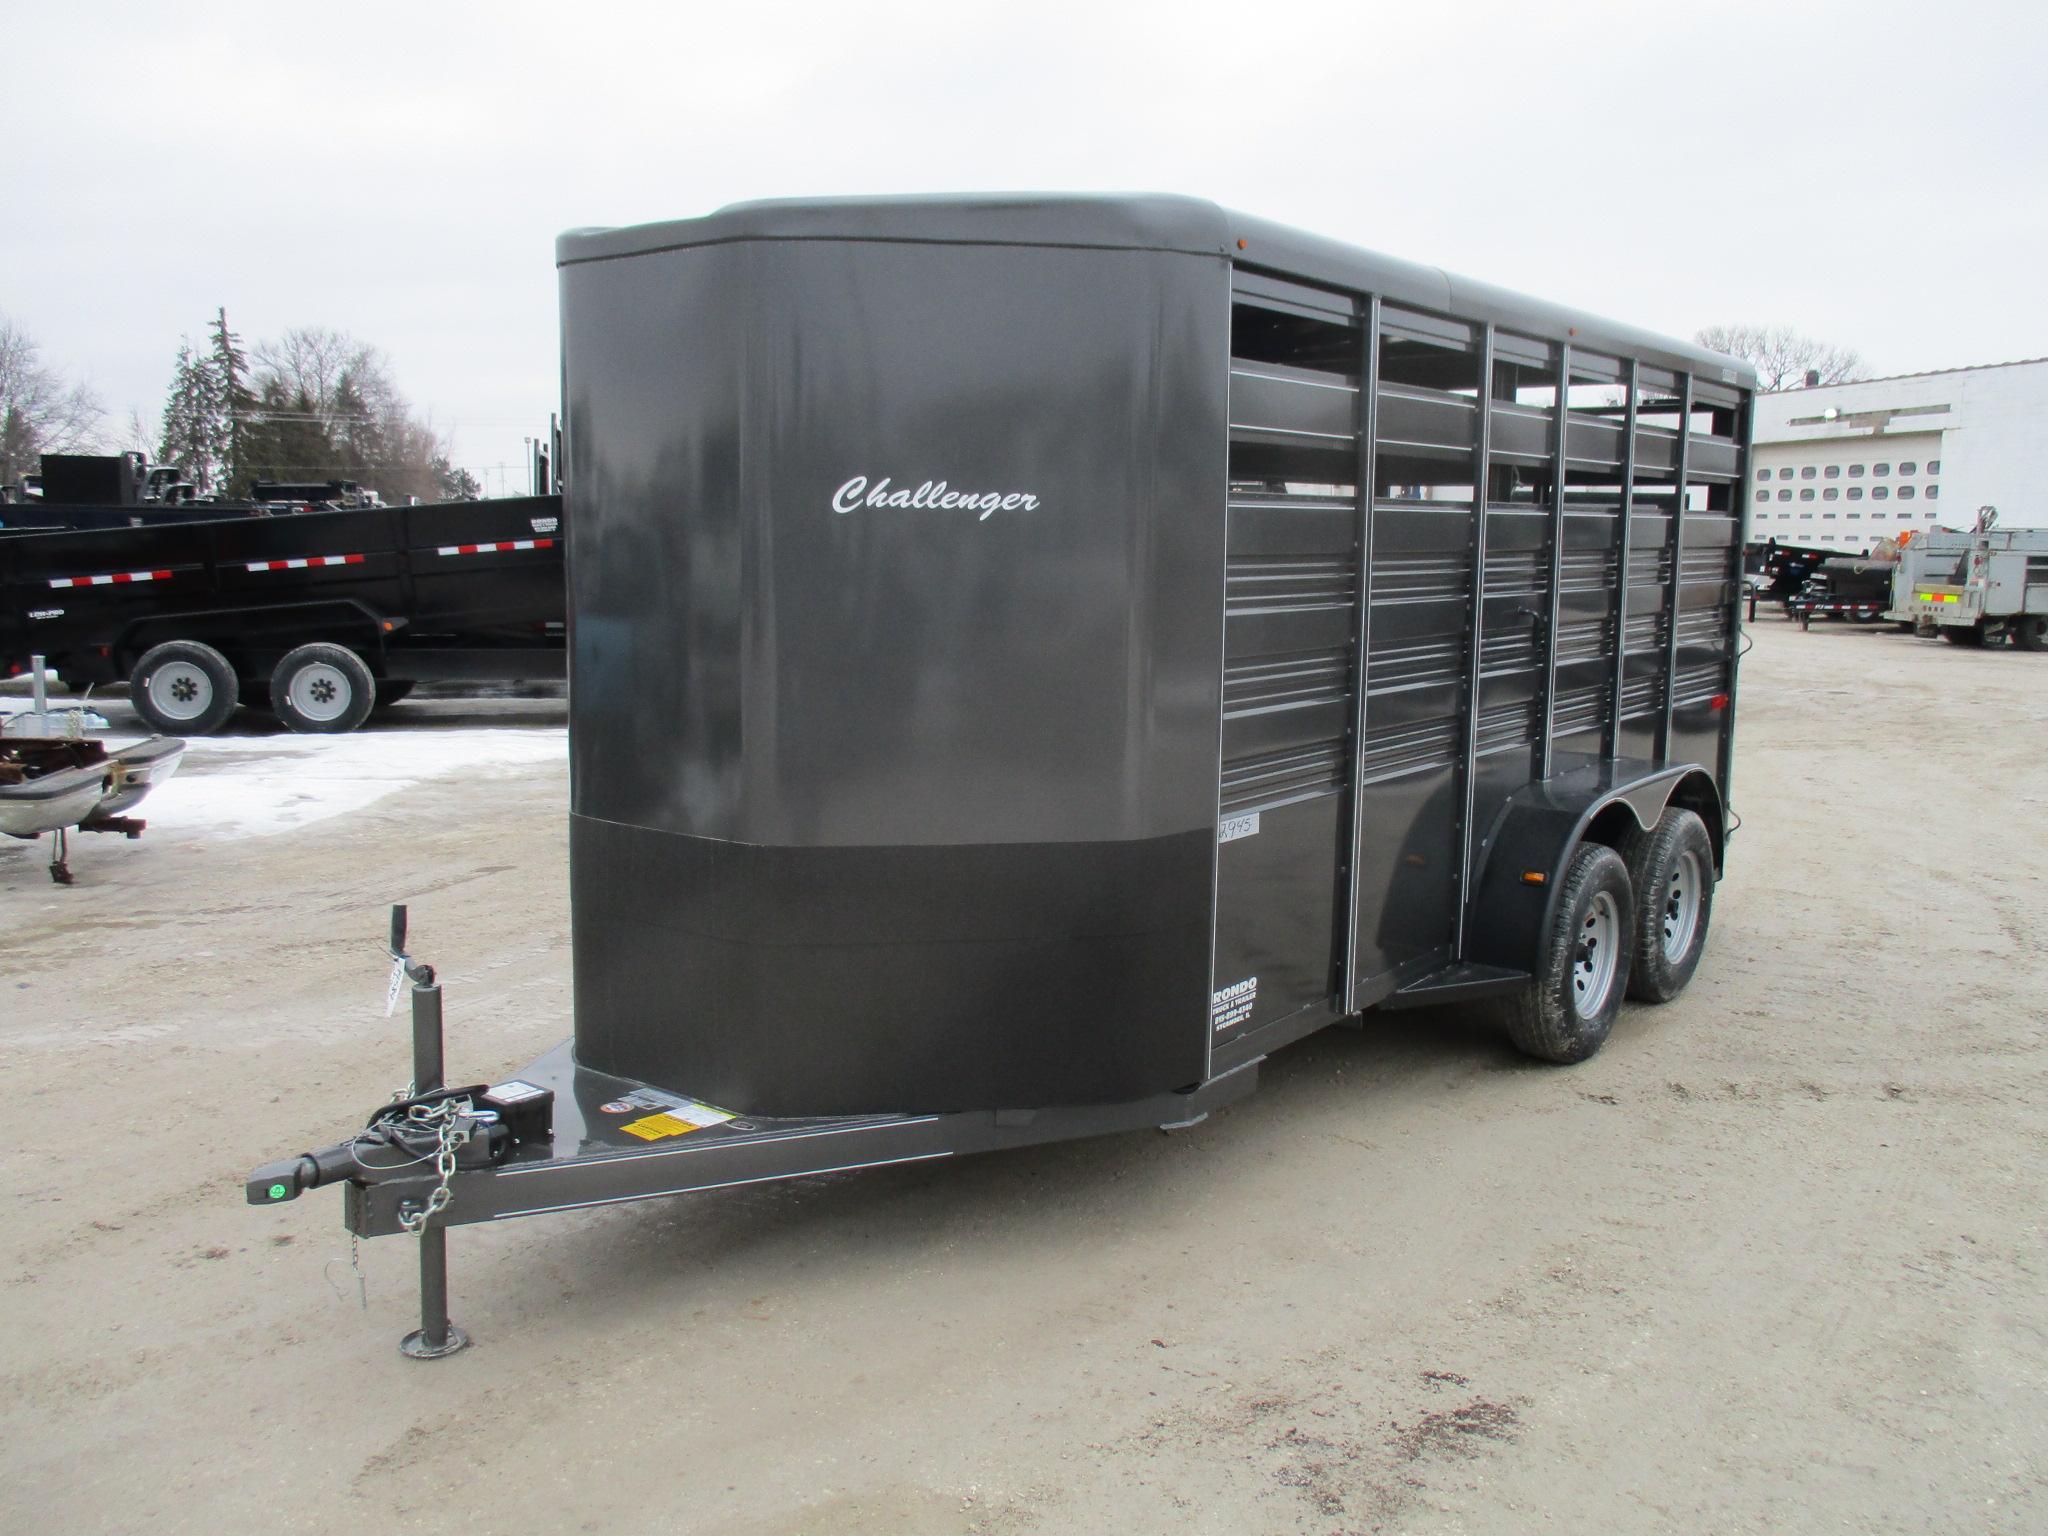 2020 Titan 6x16  Horse Challenger